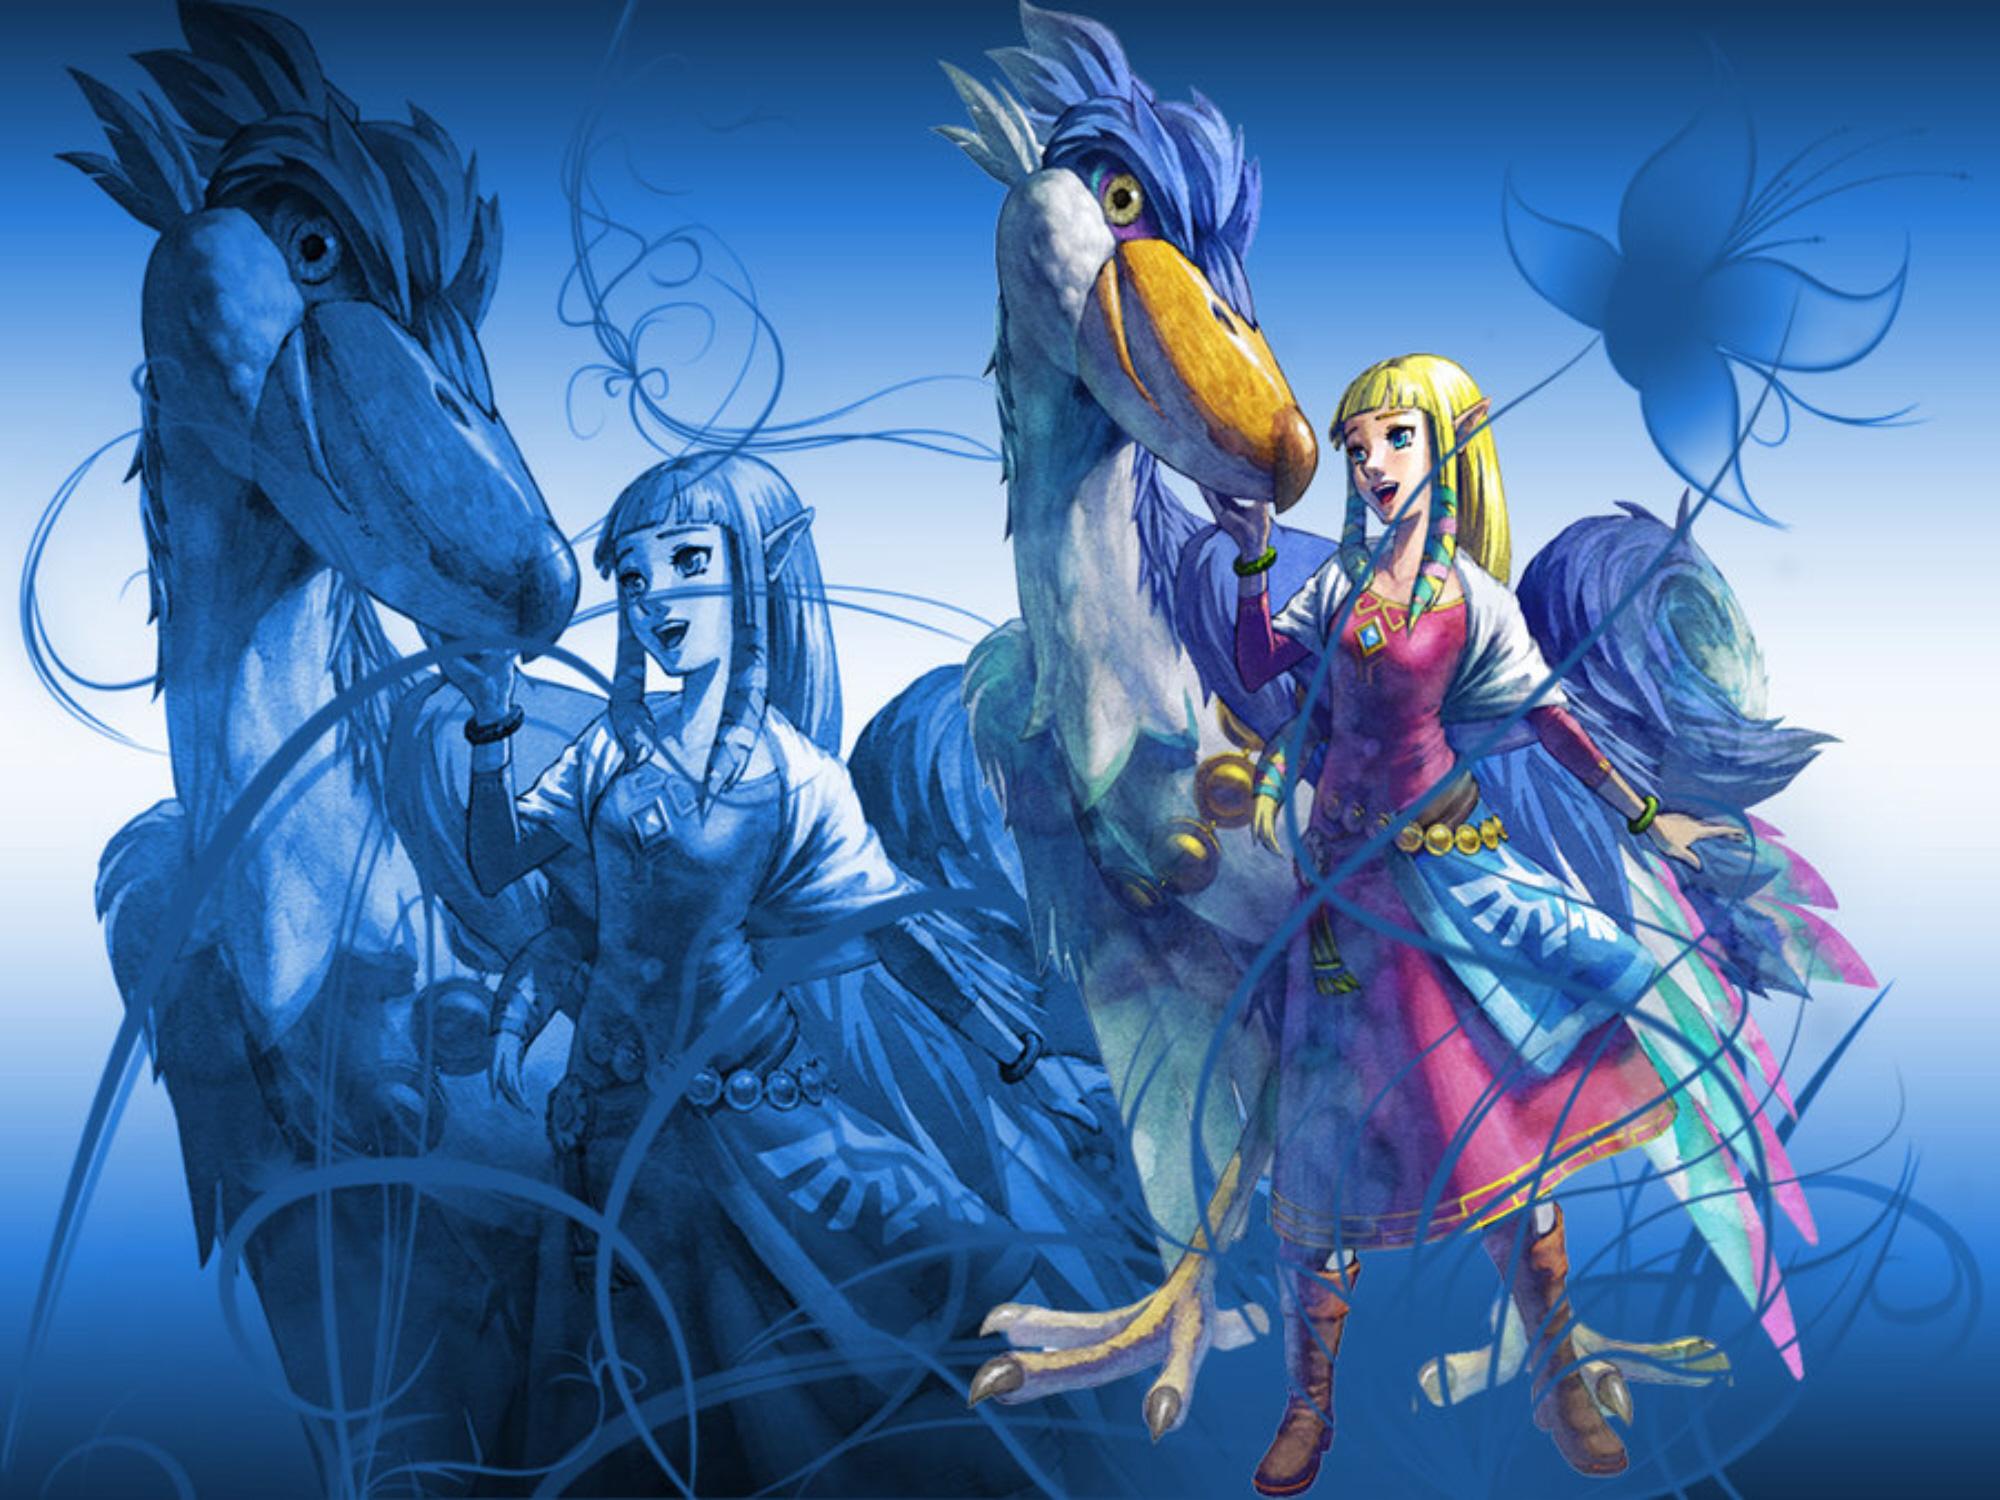 Star Wallpaper Cute Kawaii Zelda Skyward Sword Wallpaper Cute Princess Zelda